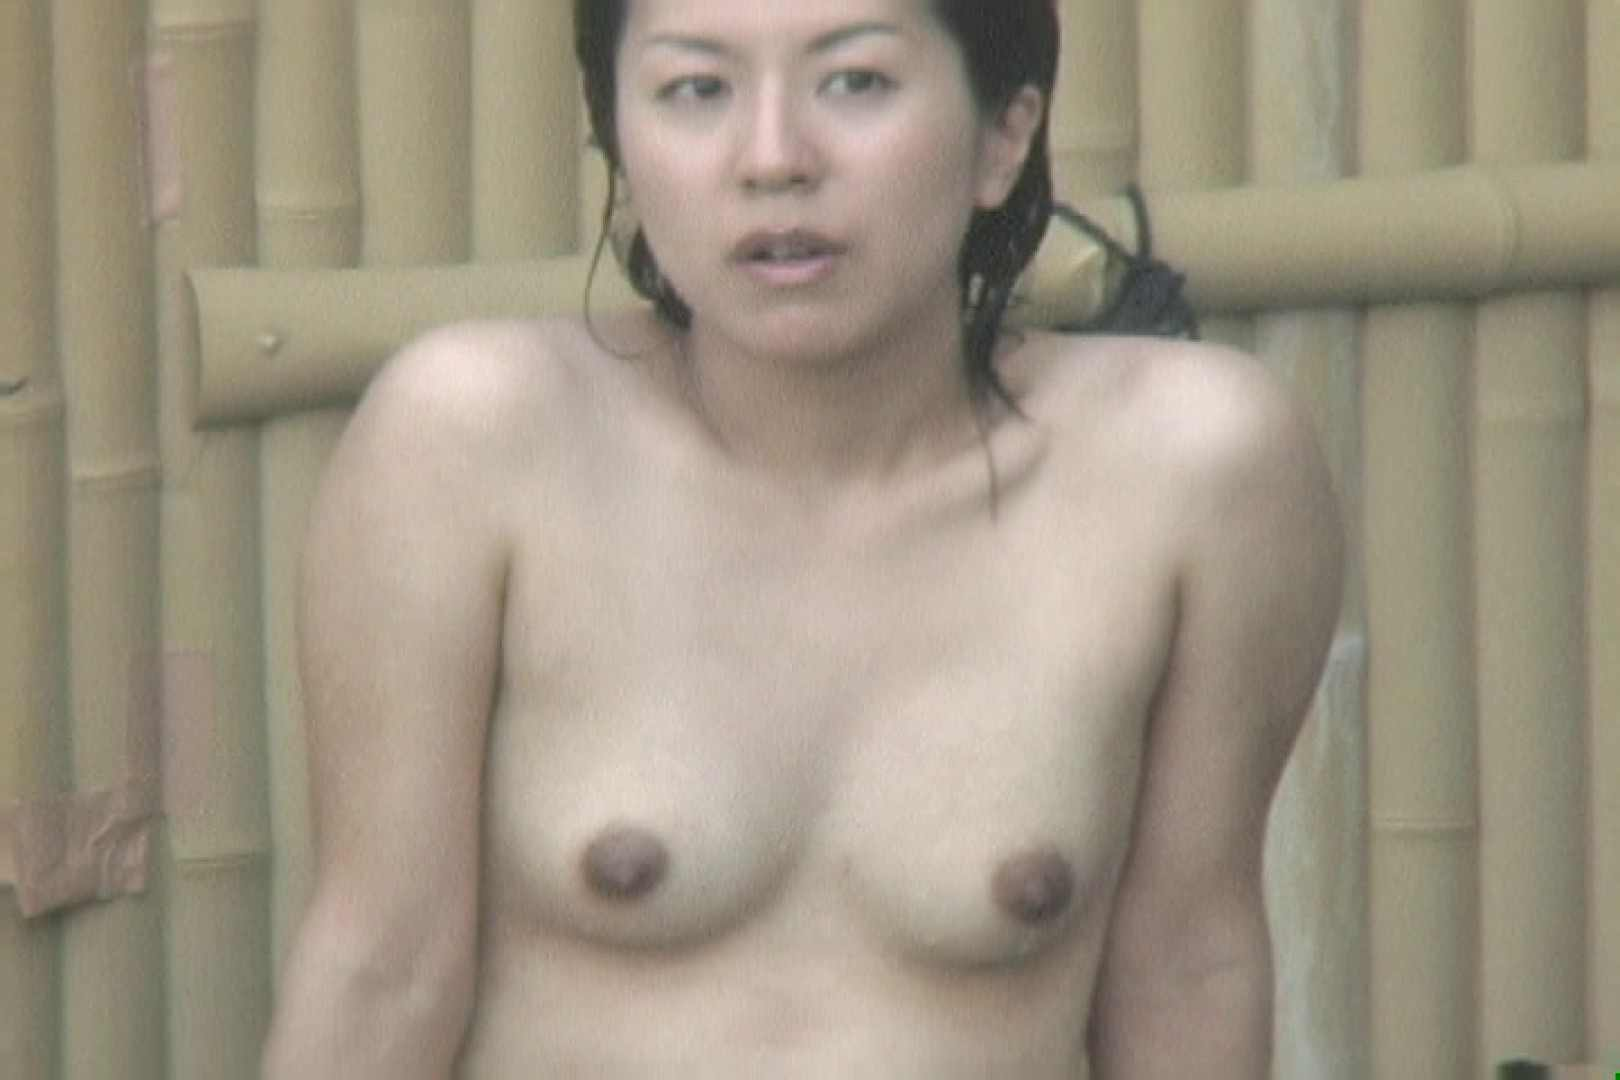 Aquaな露天風呂Vol.694 露天 オメコ無修正動画無料 110PICs 71